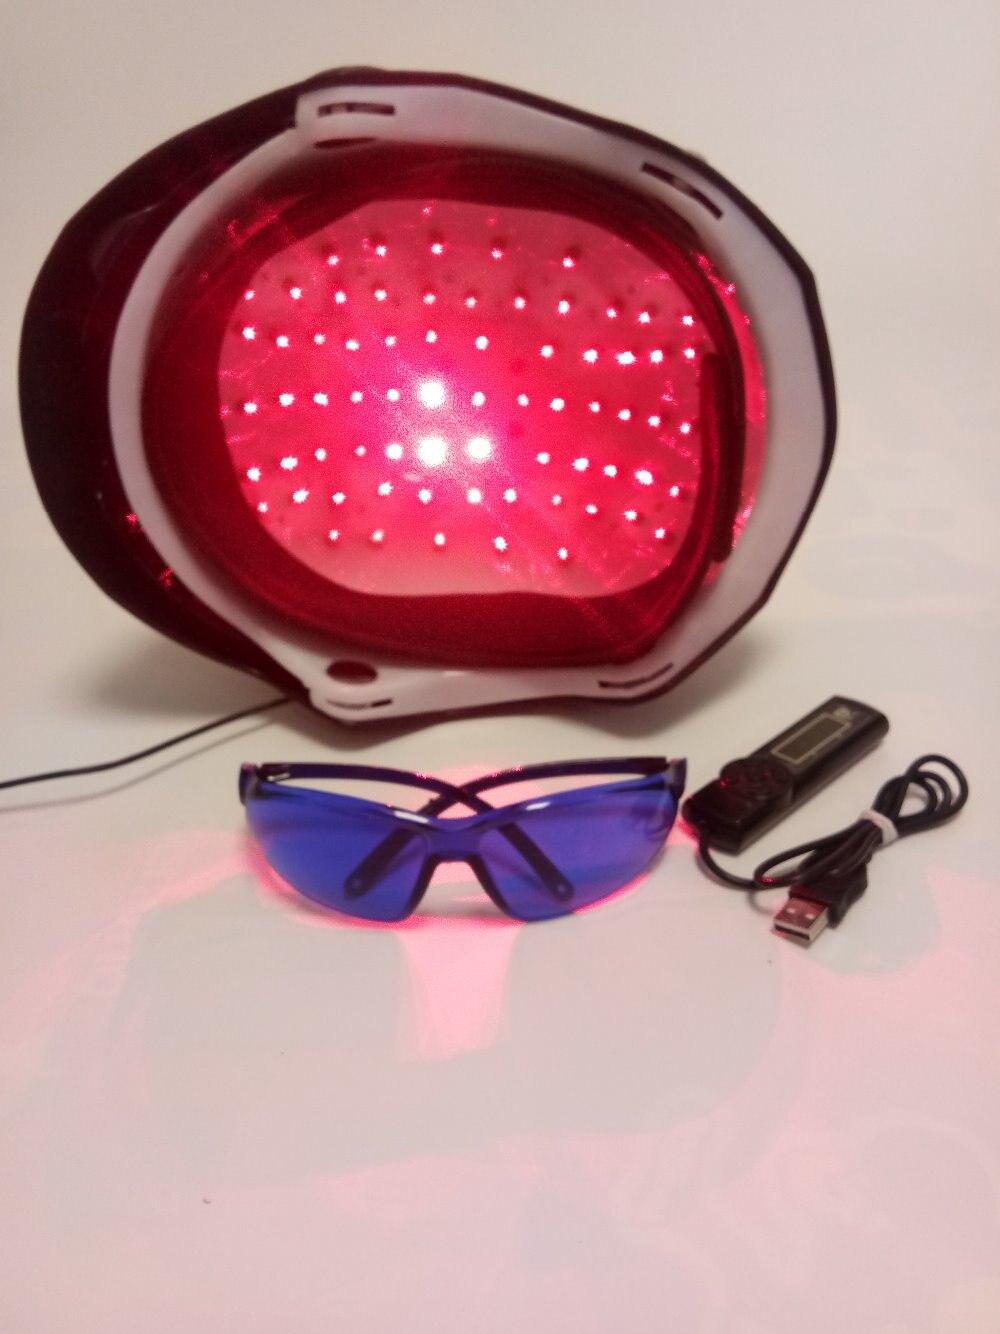 US EU PLUG USB TYPE 110V-240V hair loss products laser hat c